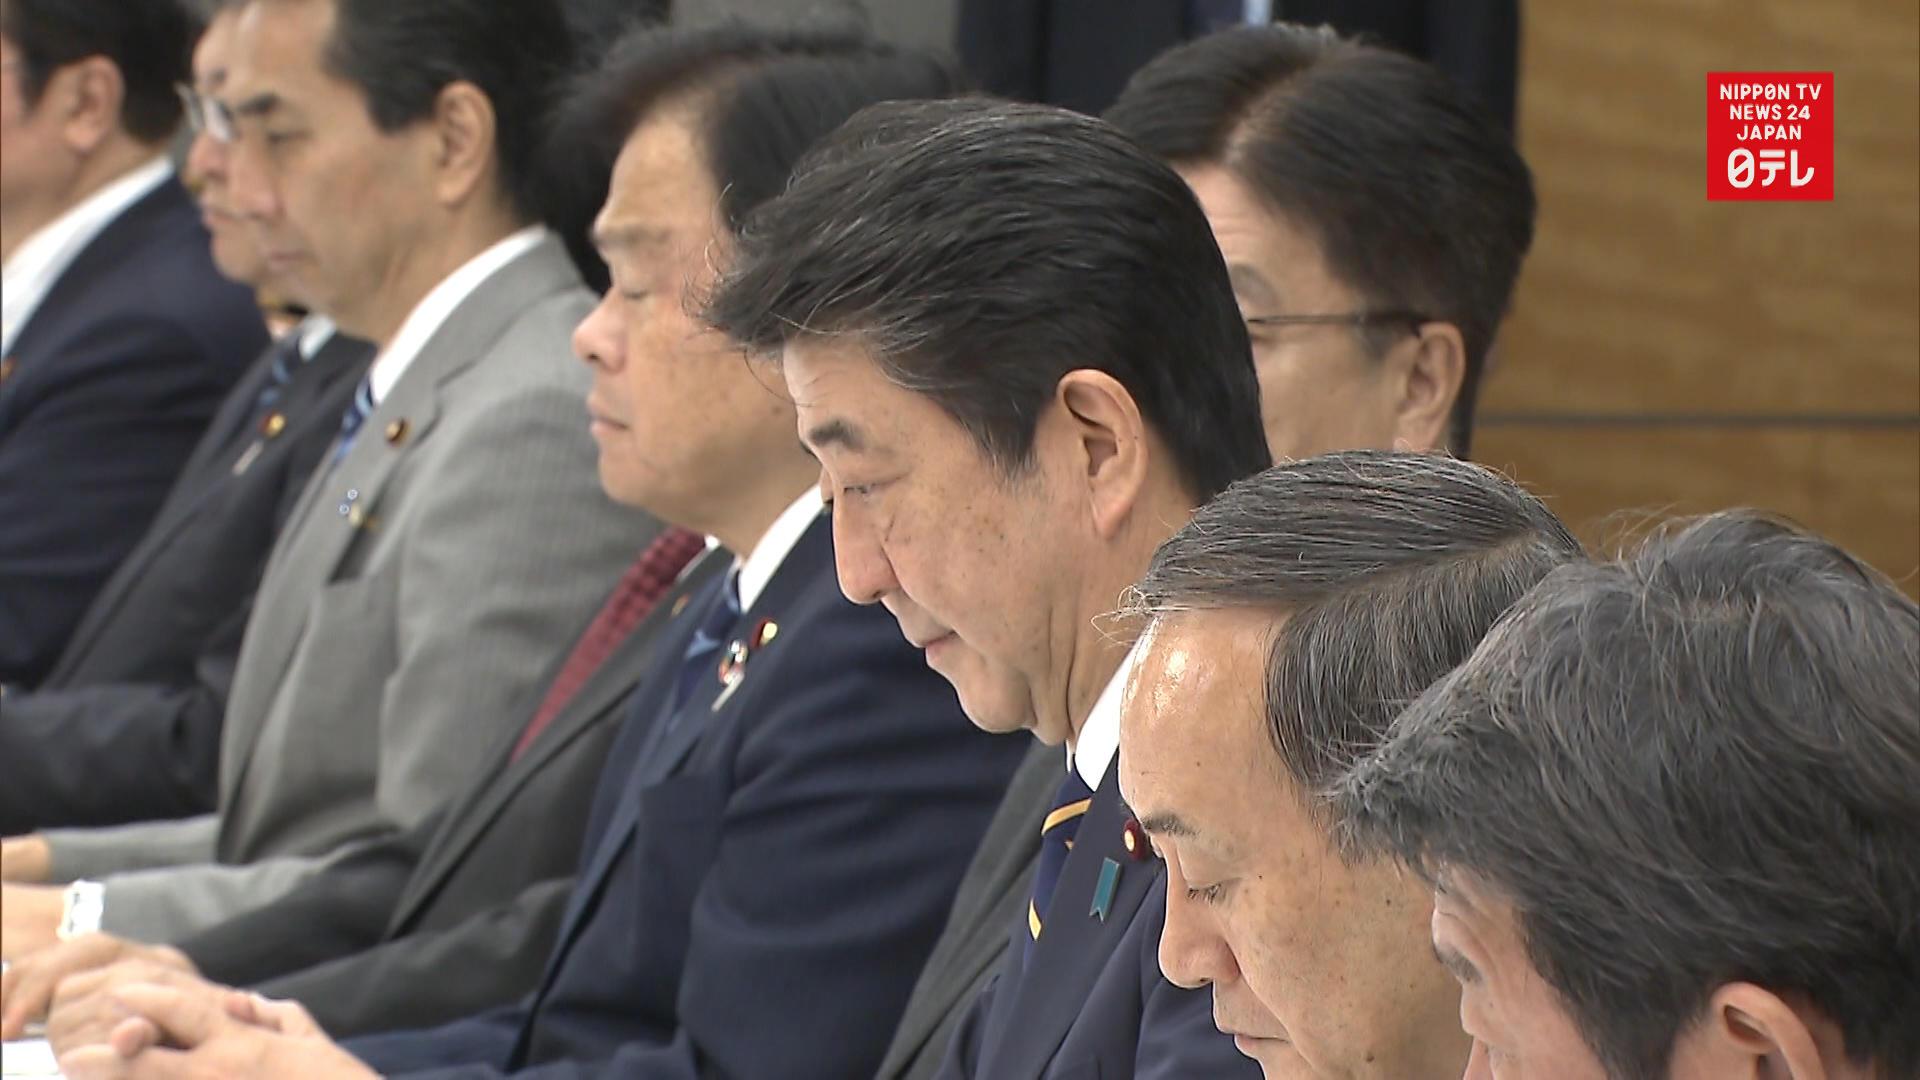 CORONAVIRUS: Japan bans entry of foreigners from Daegu